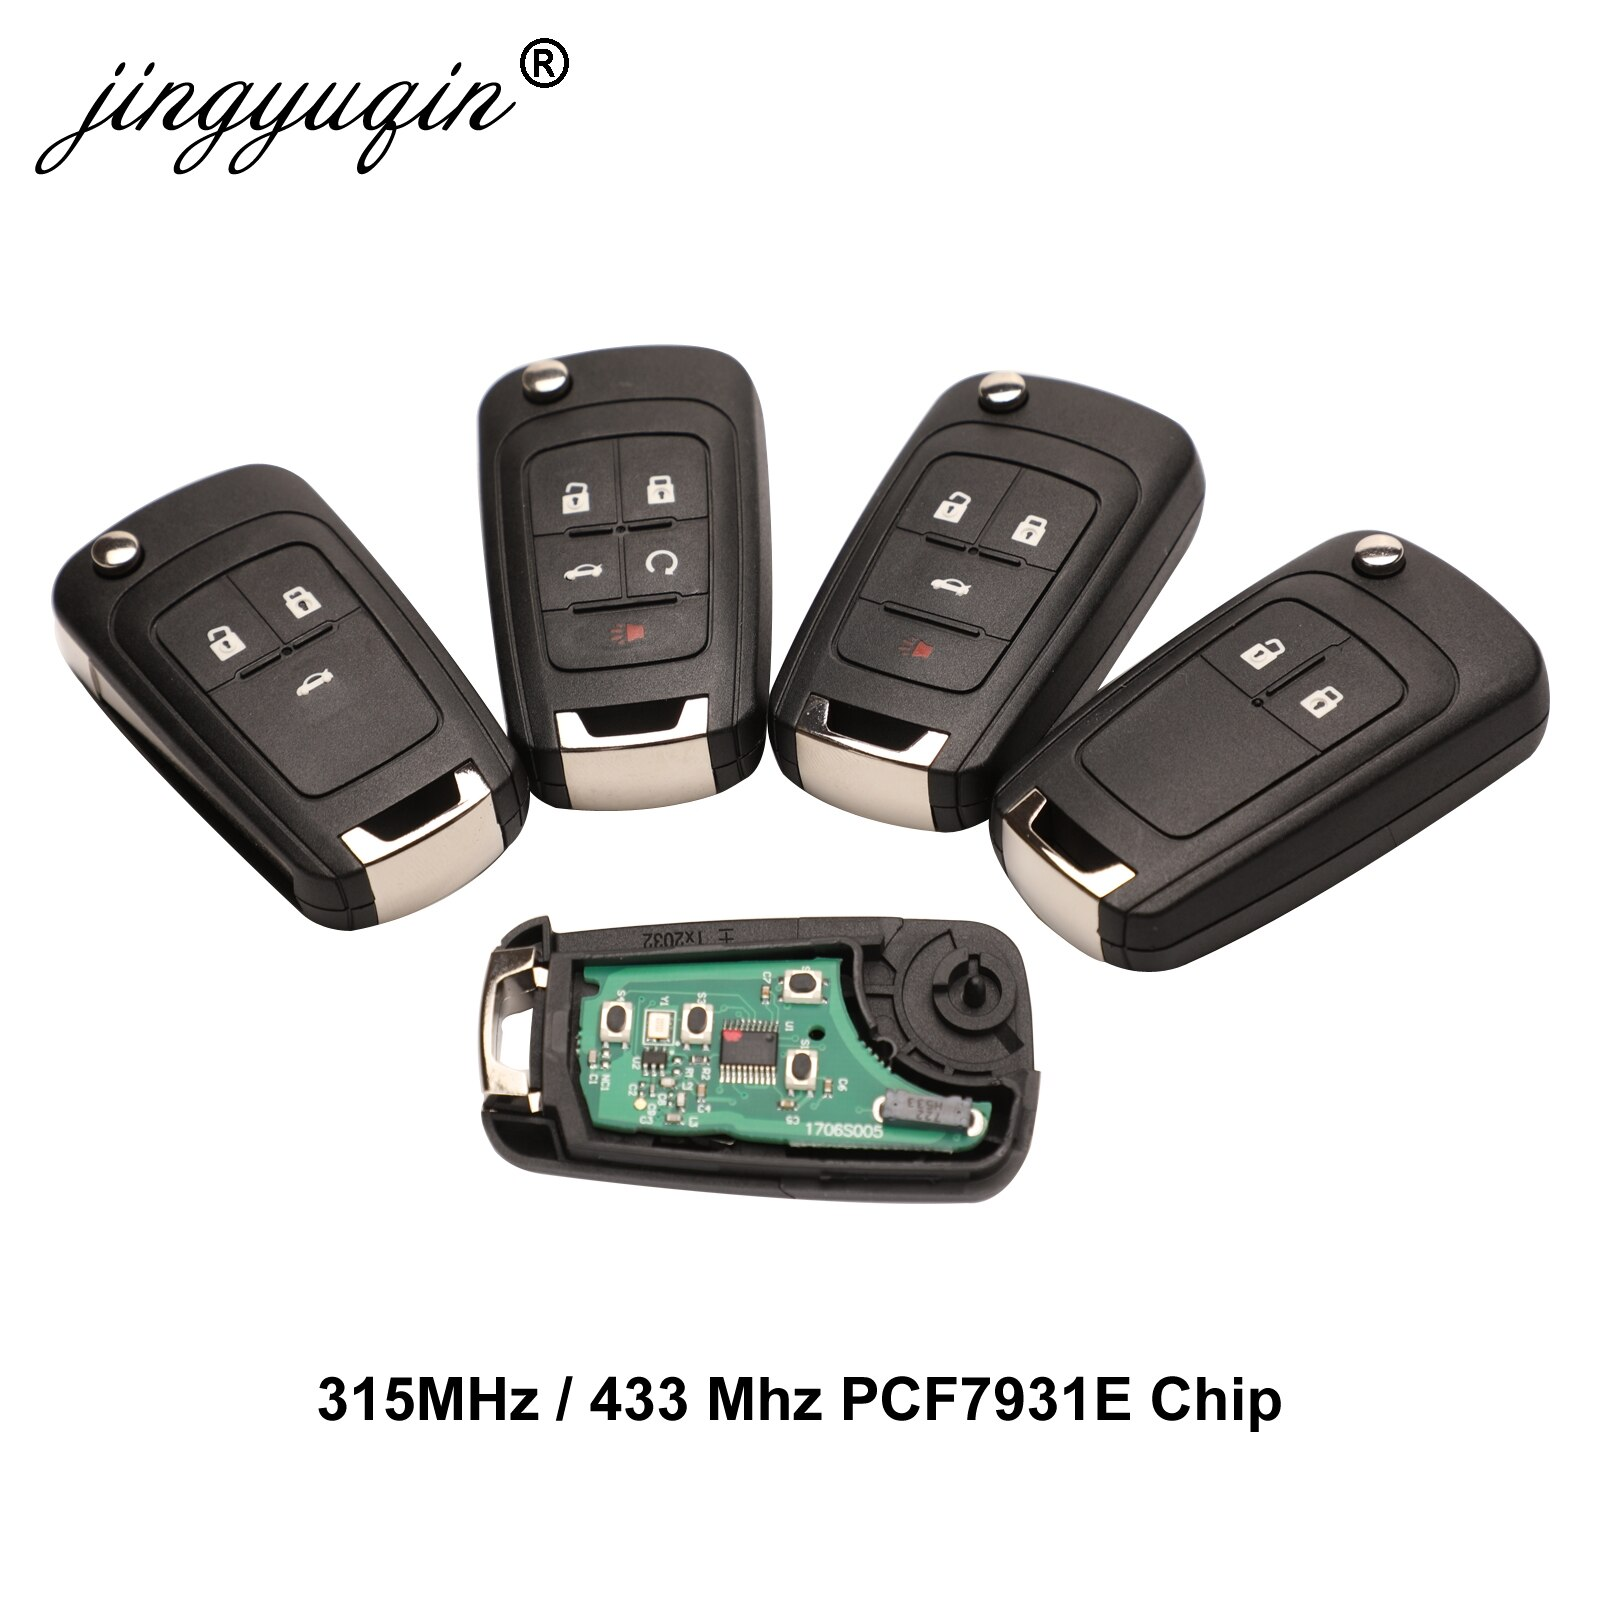 Jingyuqin Автомобильный Дистанционный ключ сигнализации для Chevrolet Cruze Epica Lova Camaro Impala 2/3/4 Кнопка 315 МГц/433 МГц ID46 PCF7931E чип-ключ